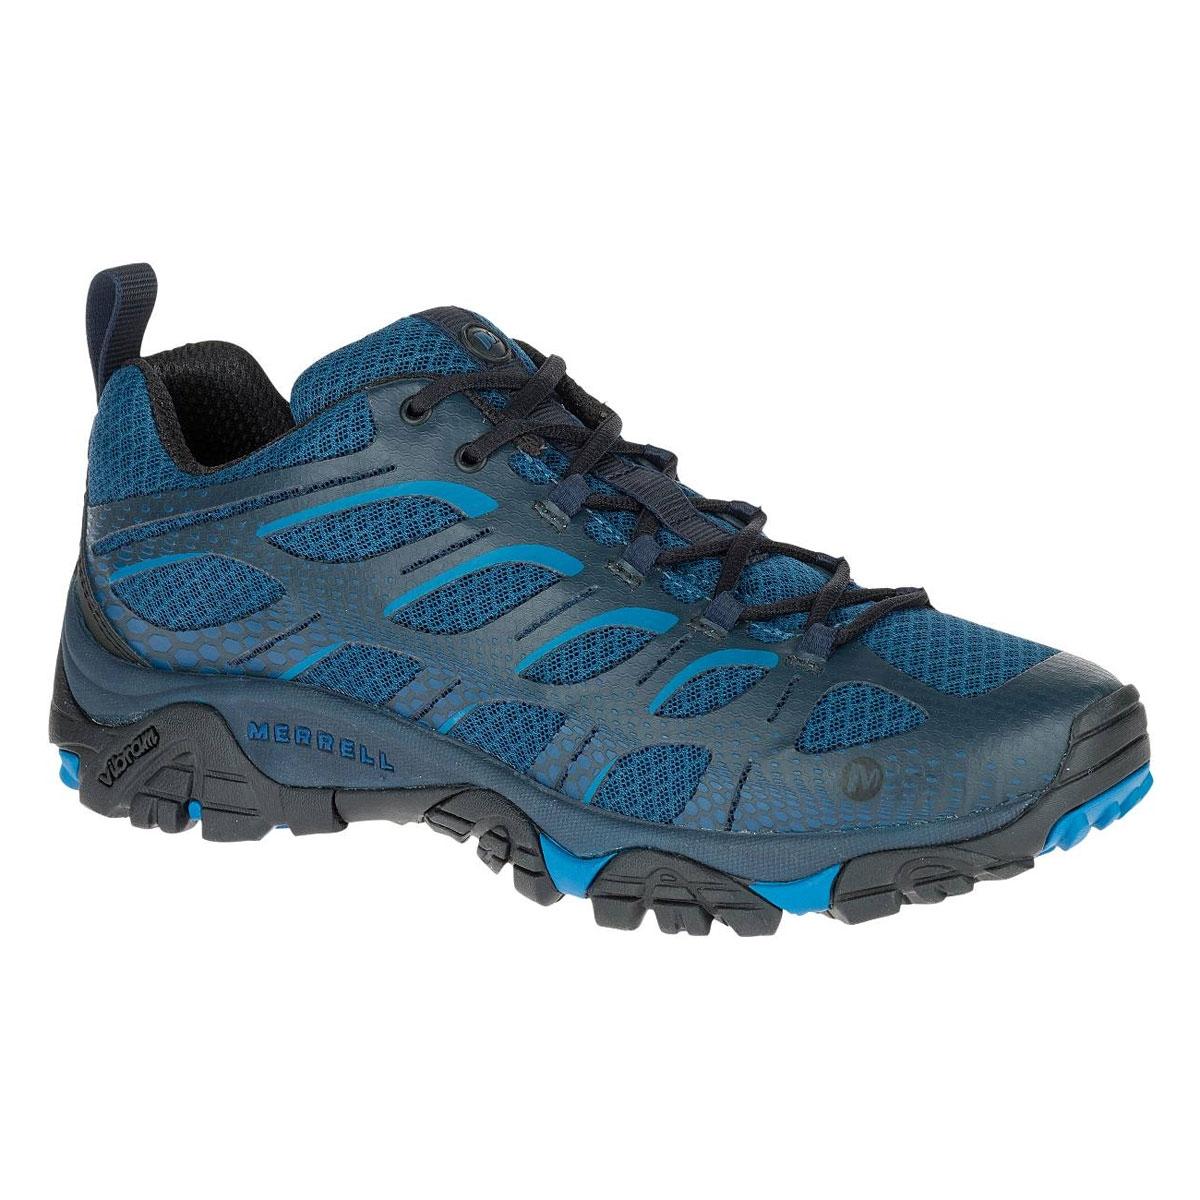 Image of Merrell Moab Edge Walking Shoes (Men's) Poseidon